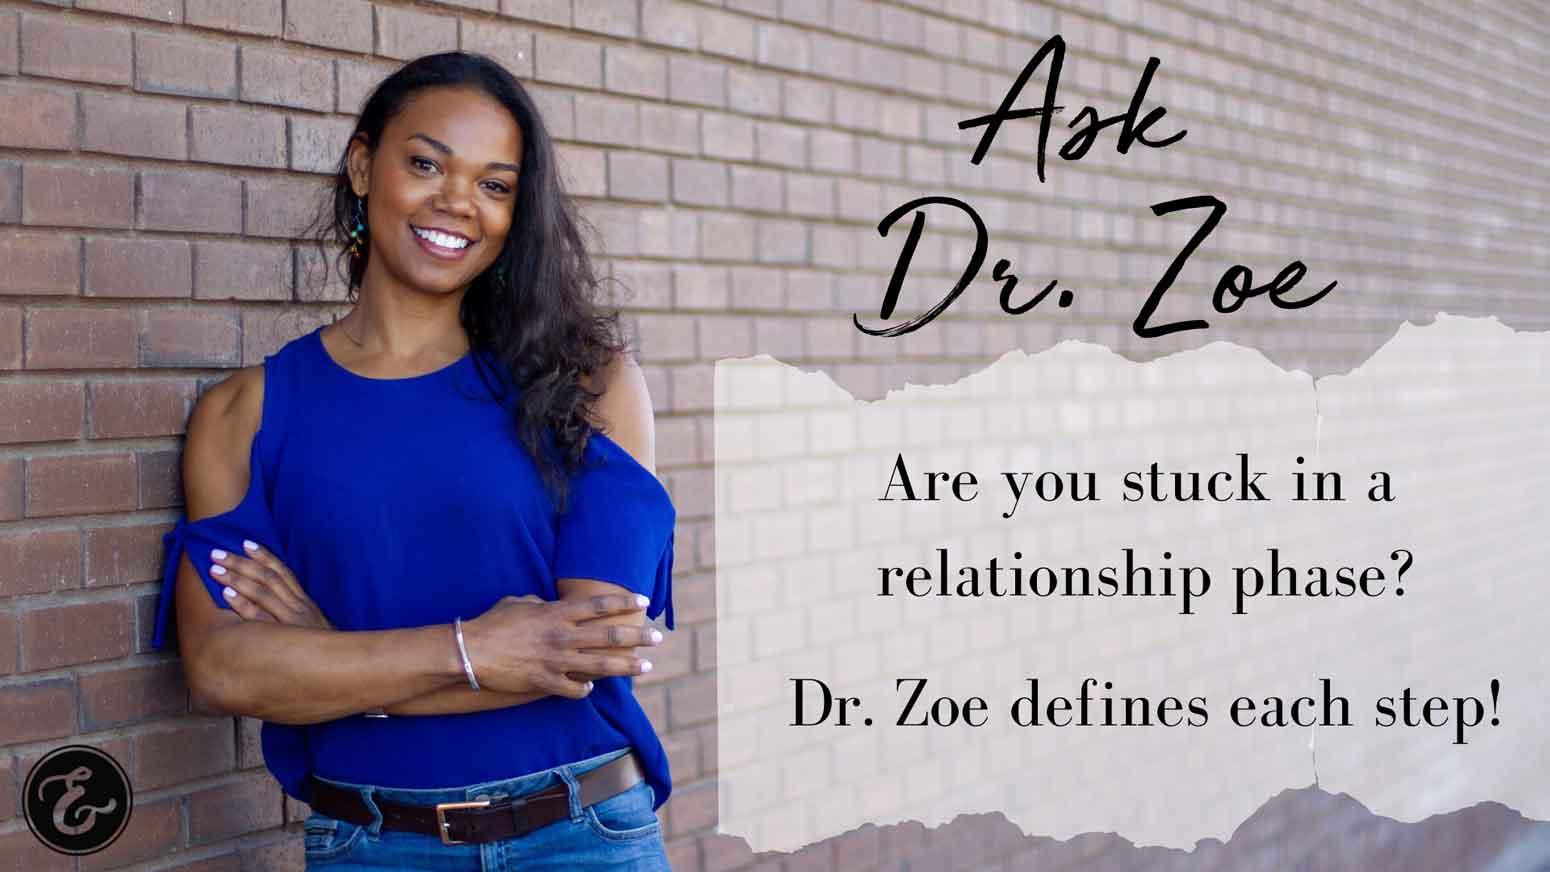 ADZ stuck in relationship phase